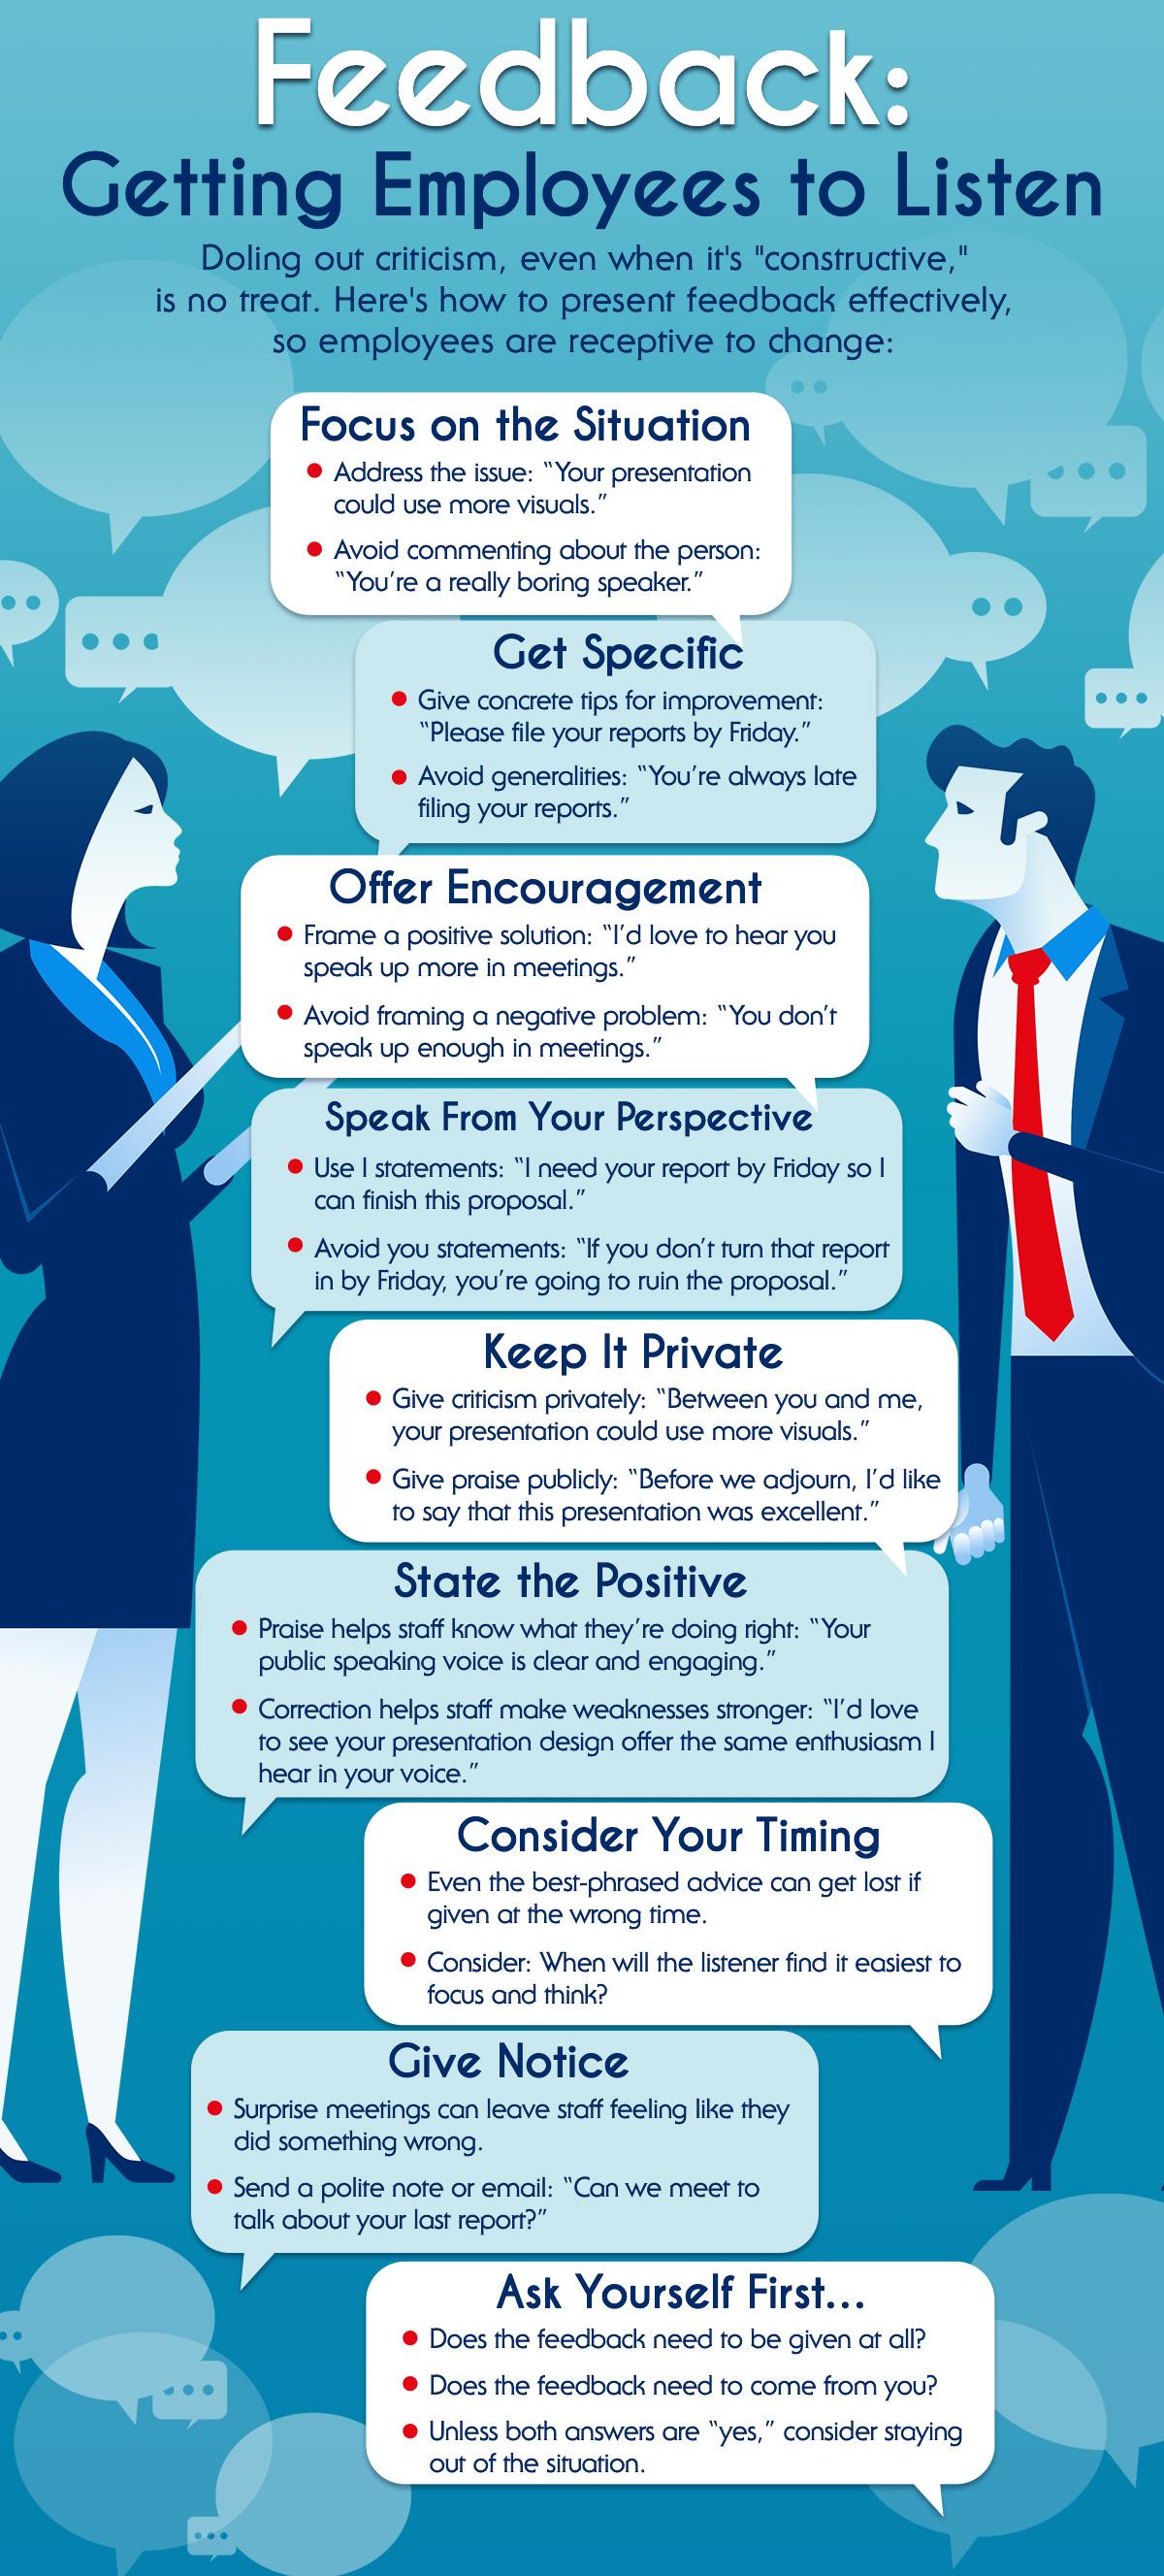 Feedback: Getting Employees to Listen